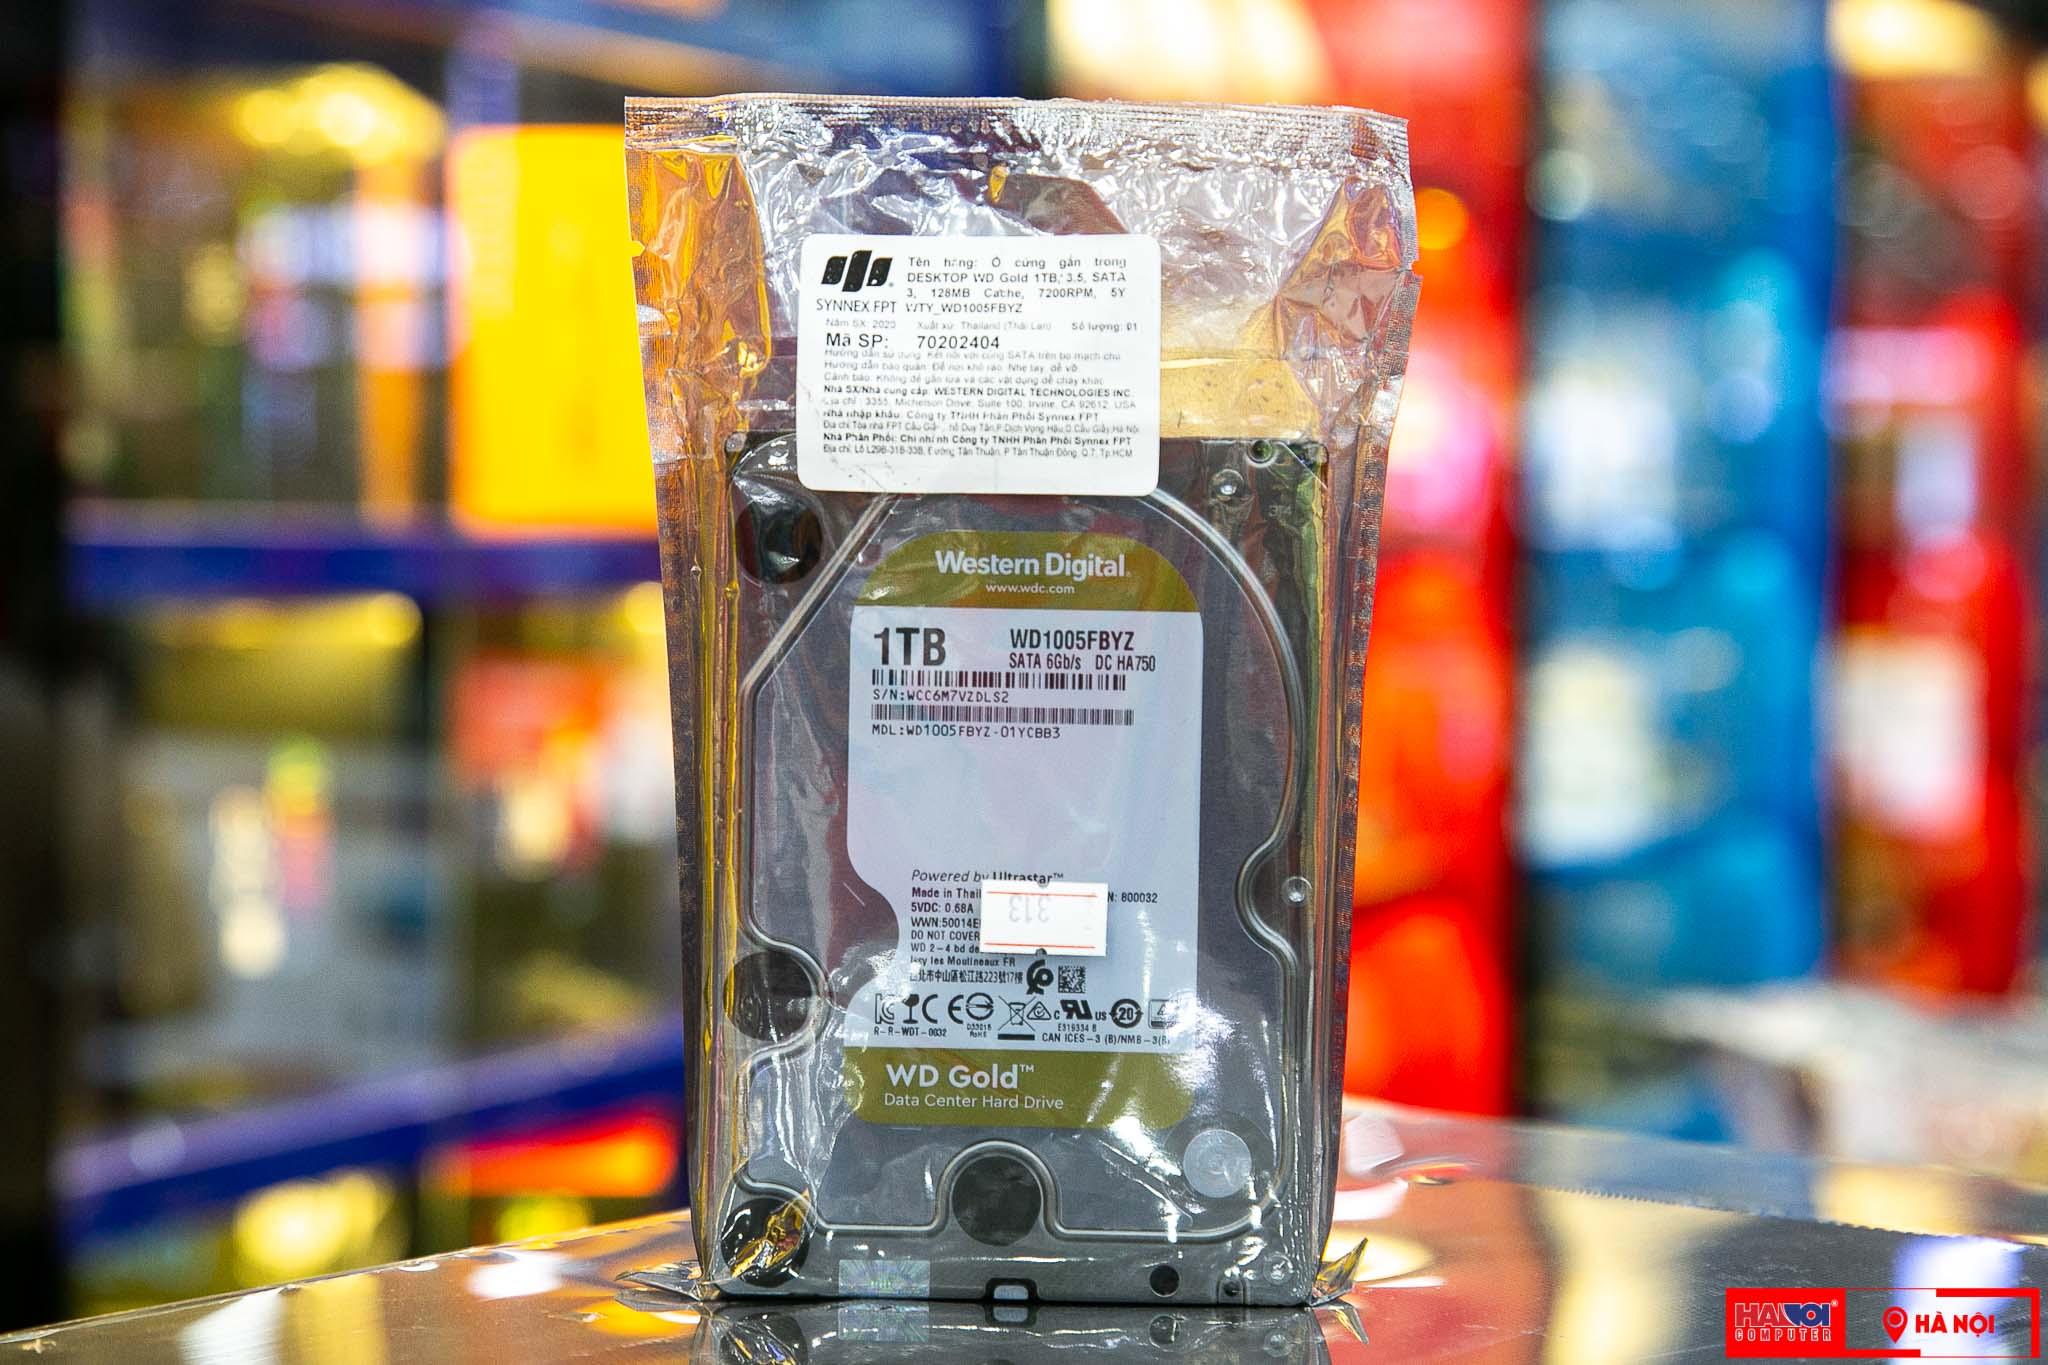 HDD WD Gold (1TB/3.5/SATA 3/128MB Cache/7200RPM) (WD1005FBYZ)